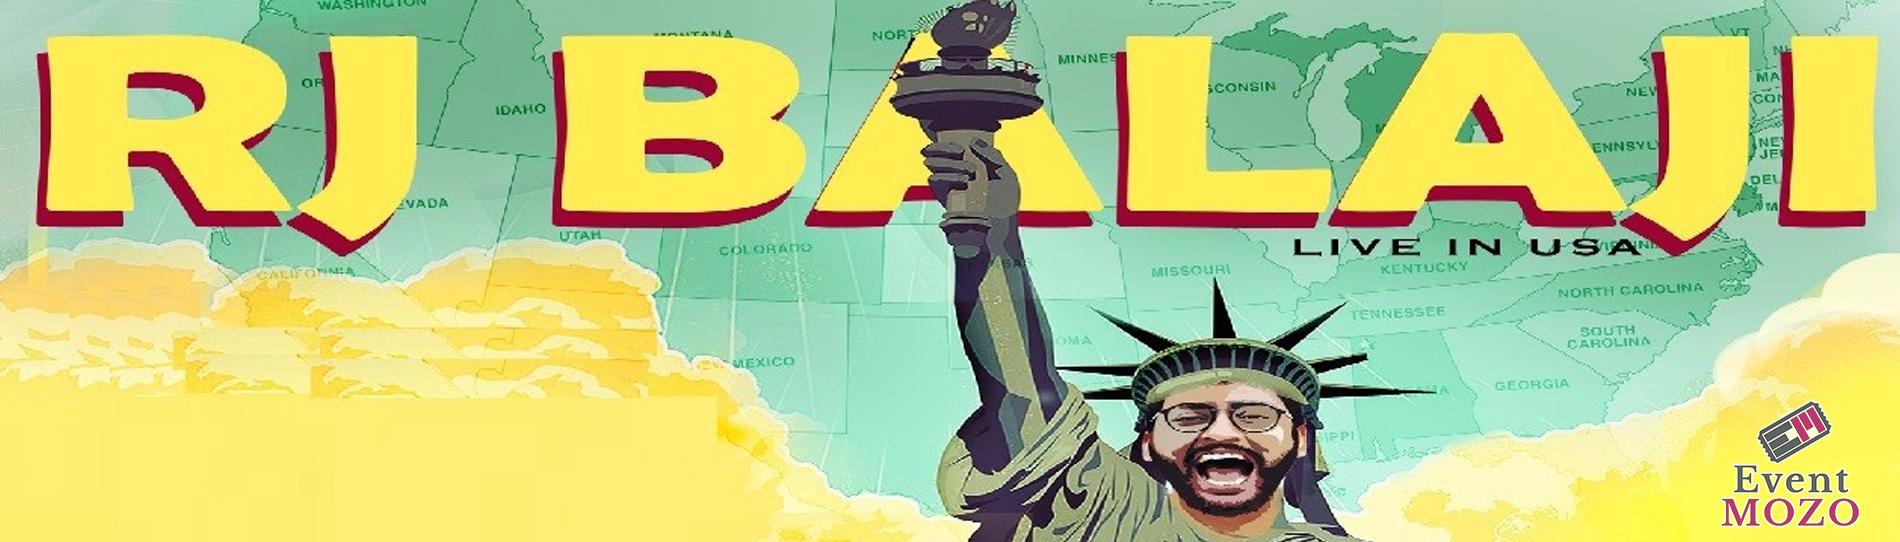 EventMozo RR international presents Kalakkal Pongal with RJ Balaji